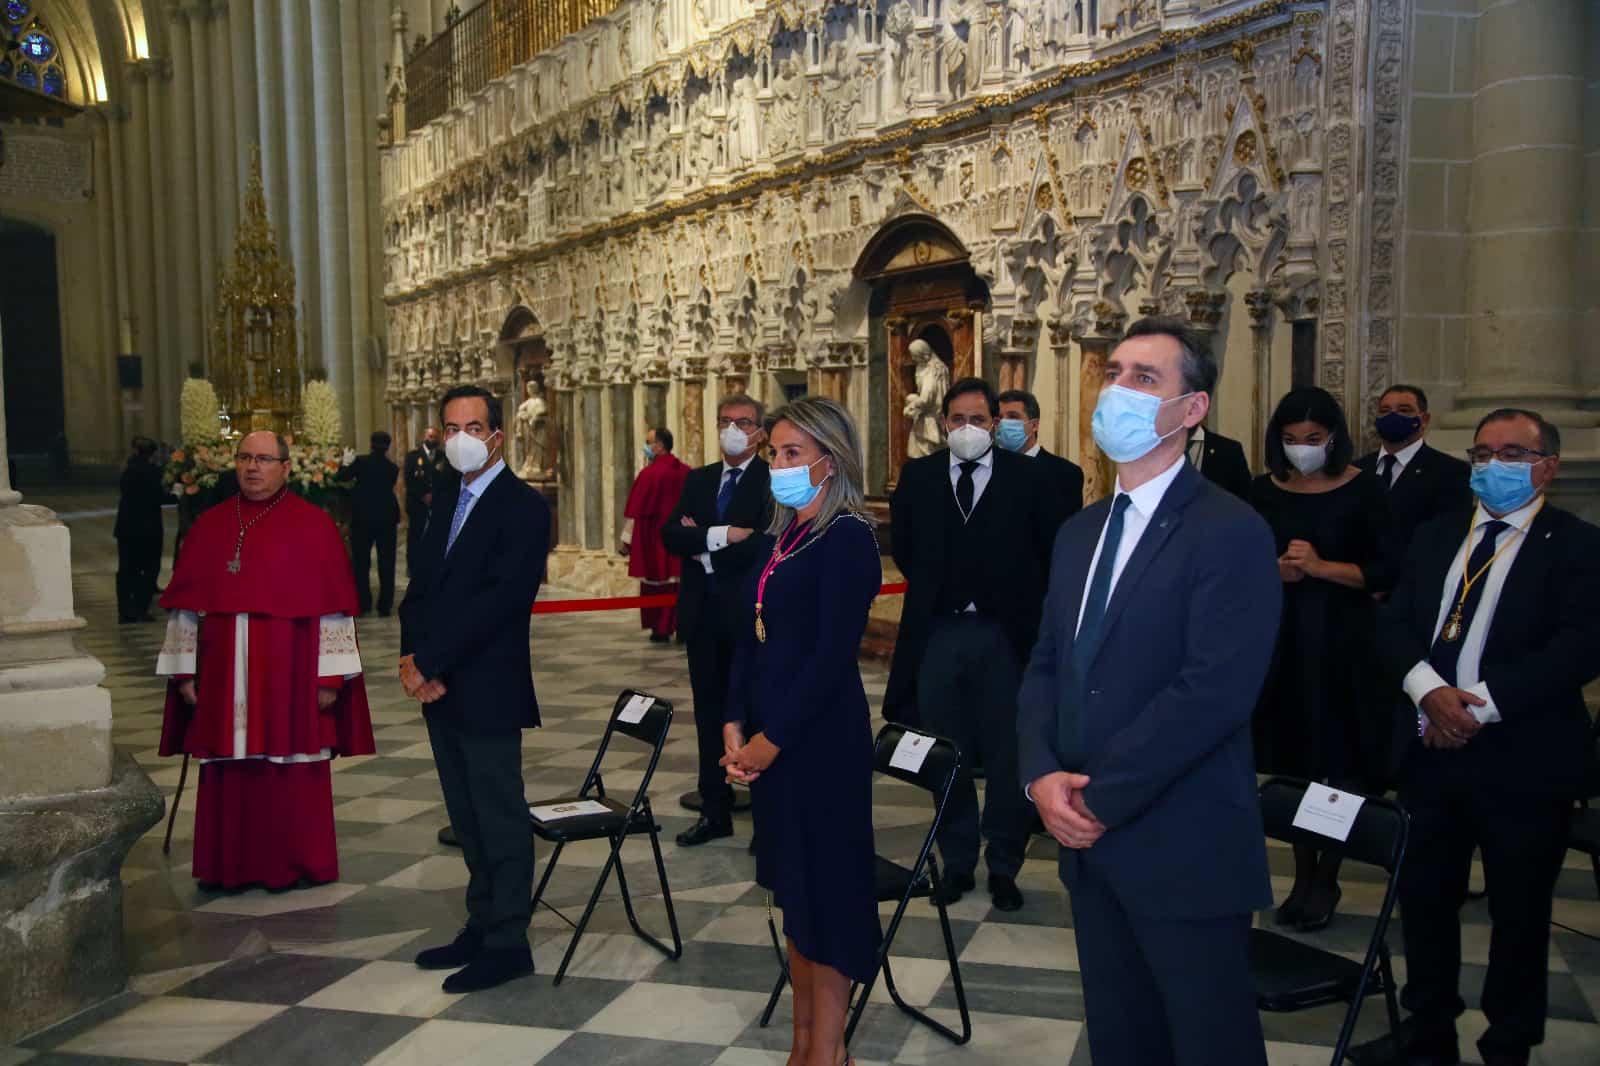 Corpus Christi sin la presencia de los feligreses